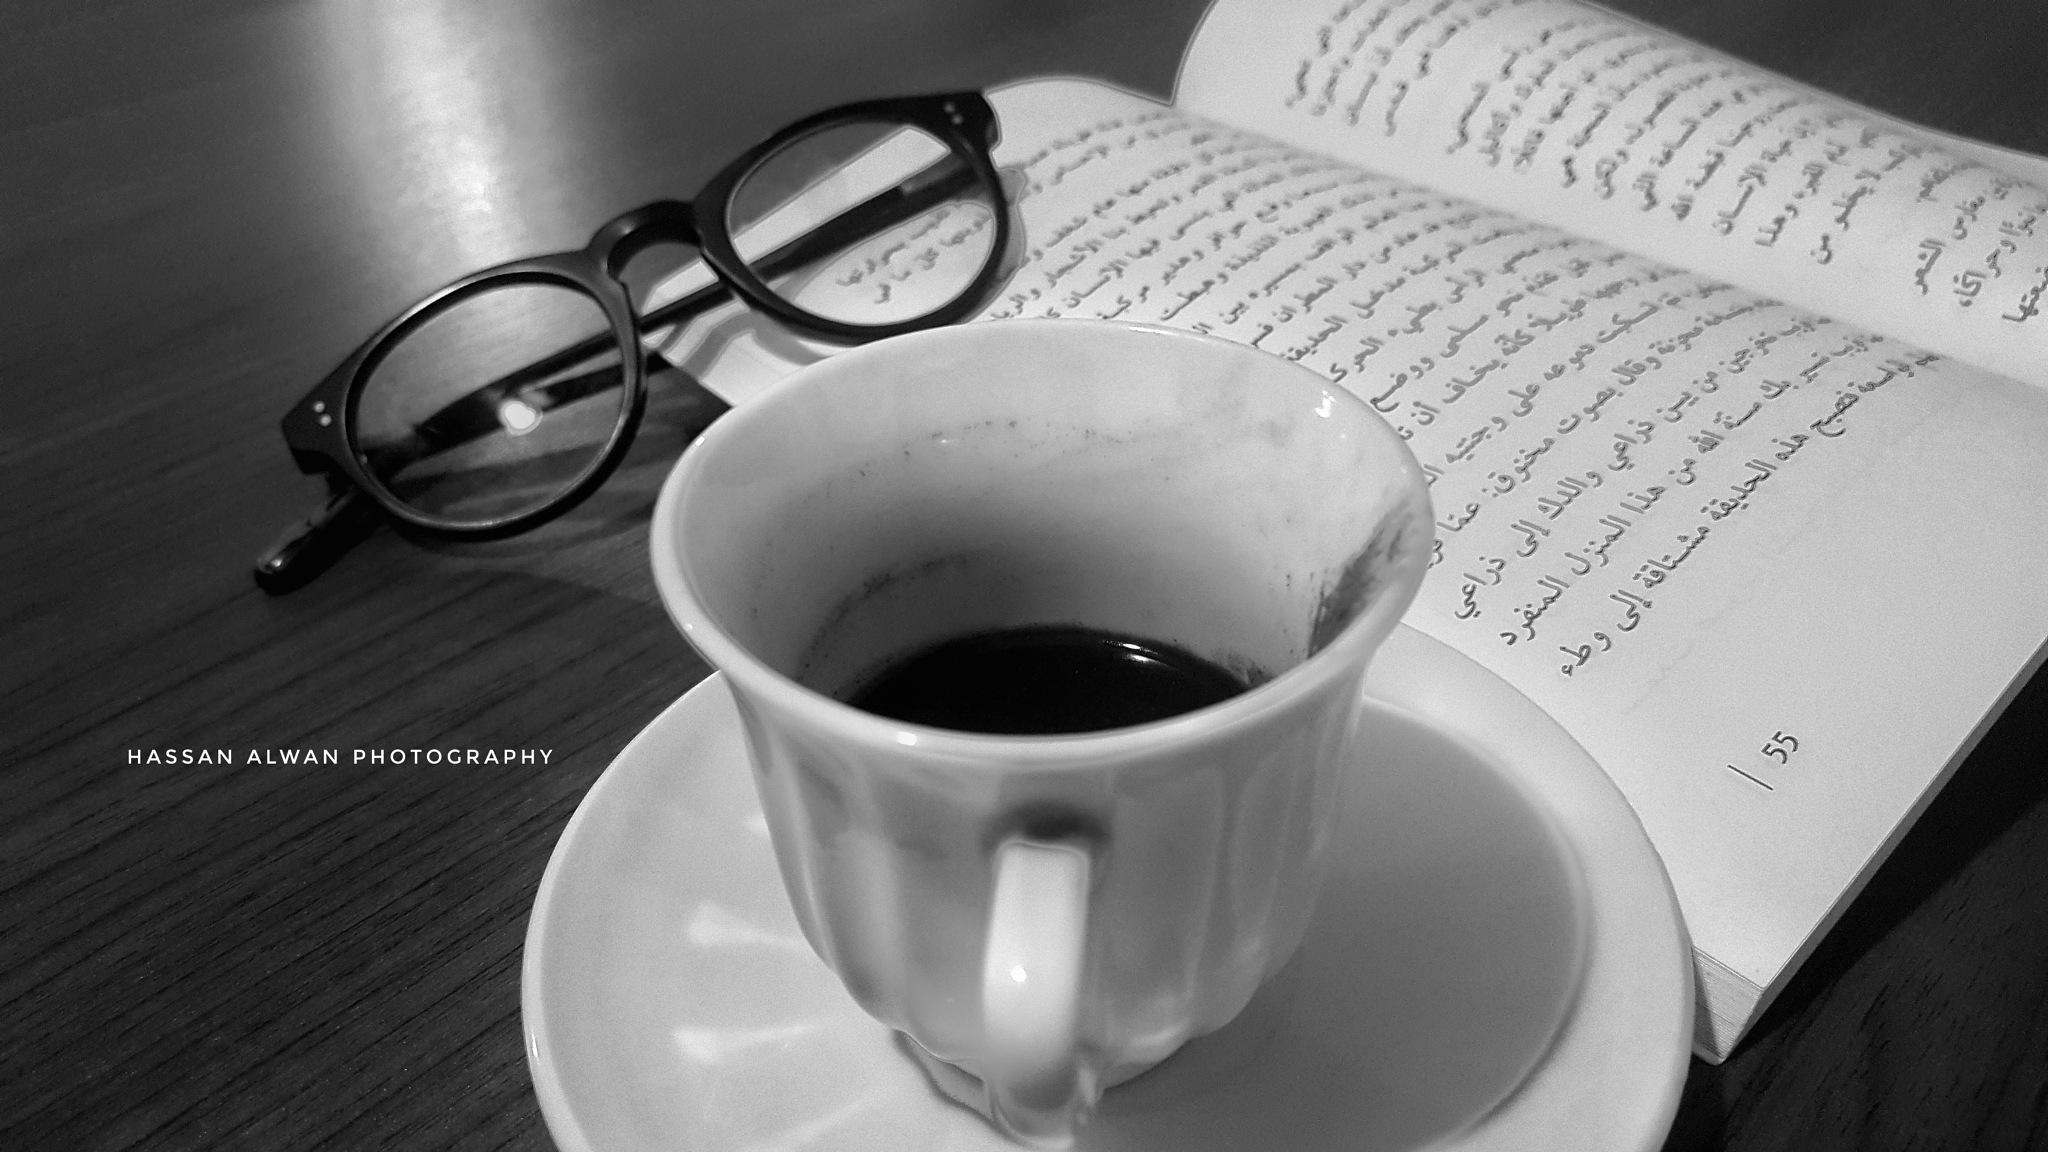 #still_life by M Hassan Alwan